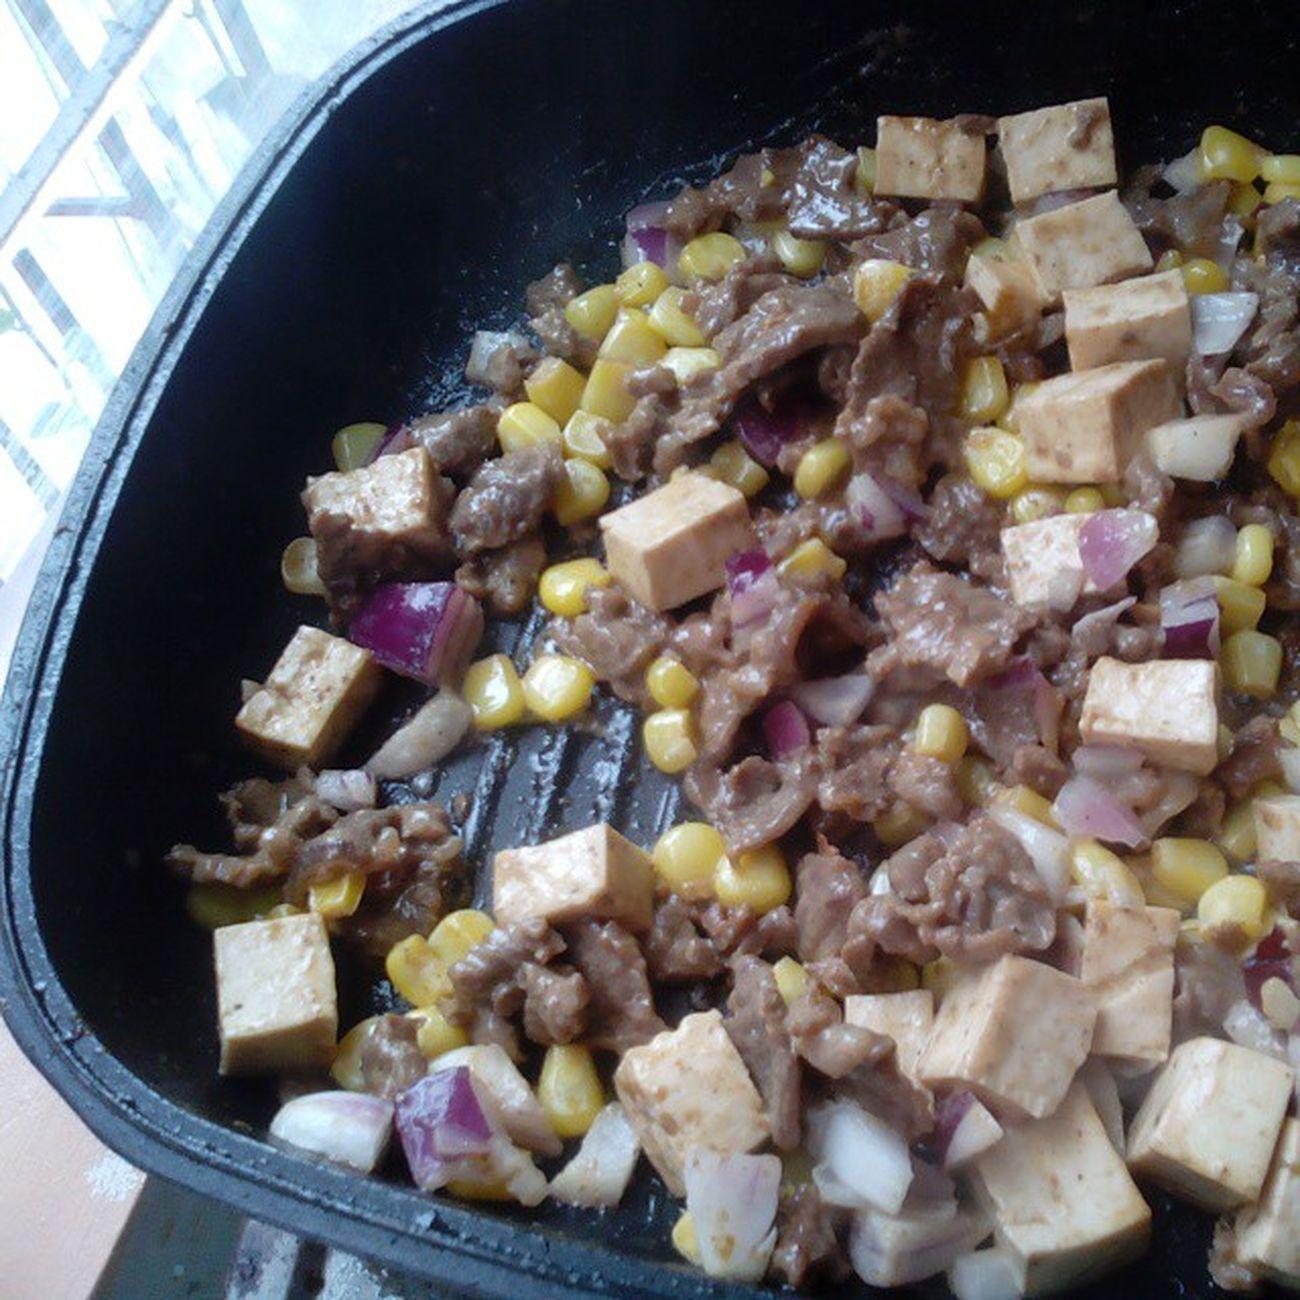 Healthy beefy lunchie.. Mangan.. 🙏🍮🍯🍫🍬🍔🍟🍦🍝🍕🍖🍗🍤 Instalike Instapic Instayum Foodporn Instafood Instagood Delish Picoftheday Kainanna Alangmak